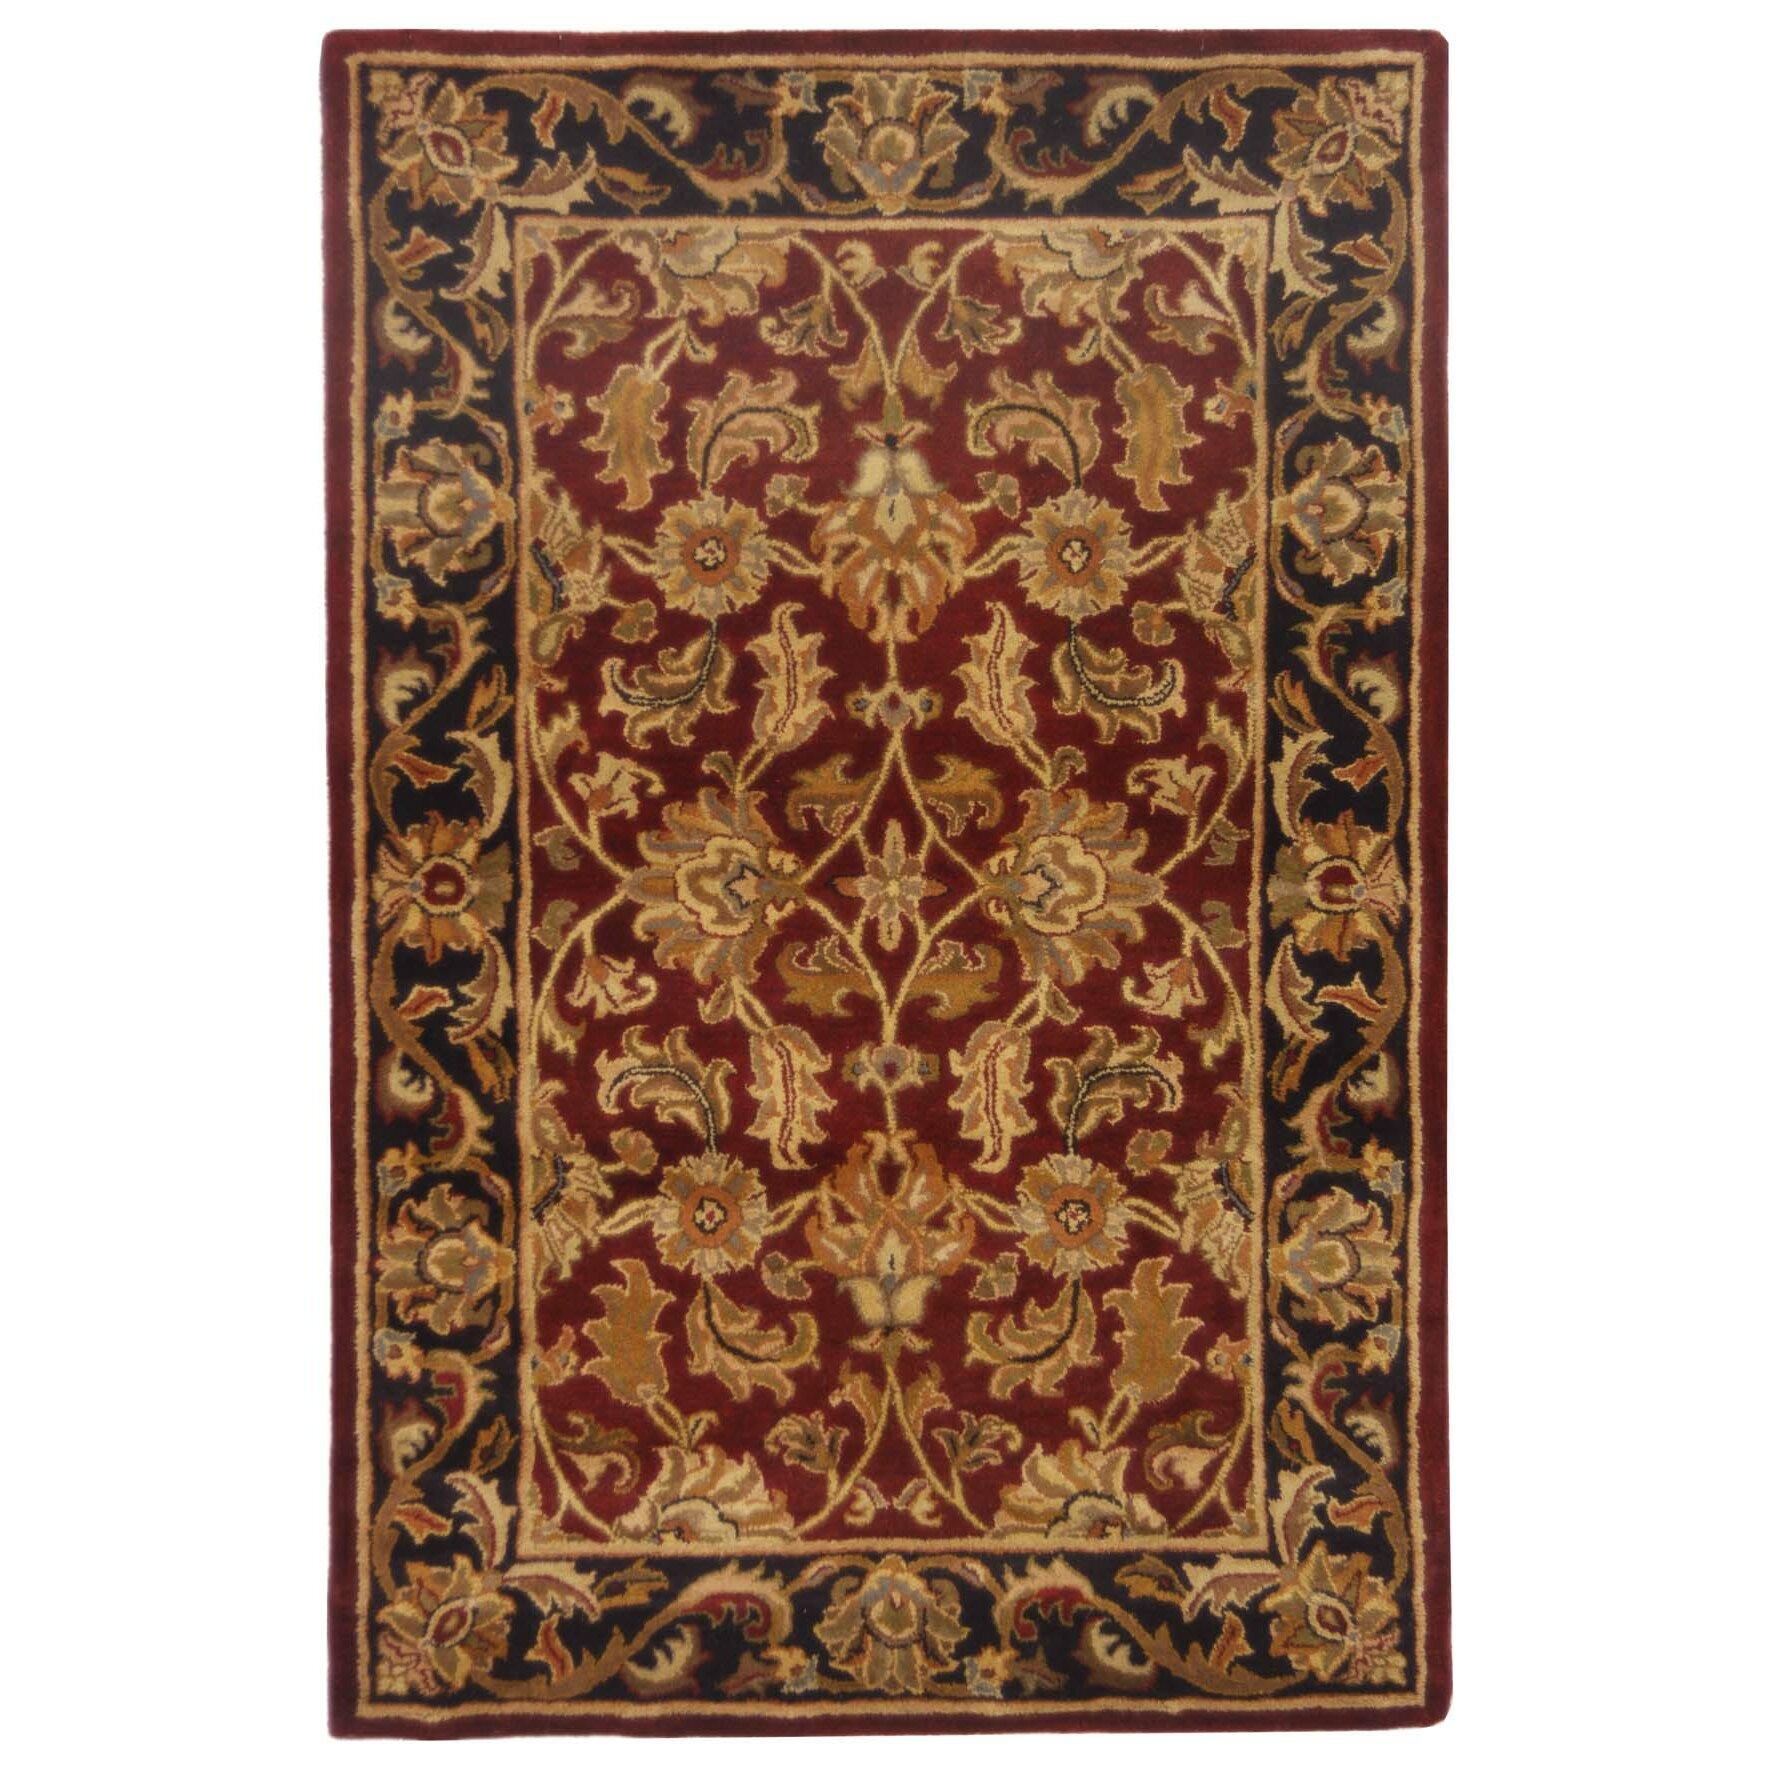 Safavieh Heritage Red & Black Floral Area Rug & Reviews